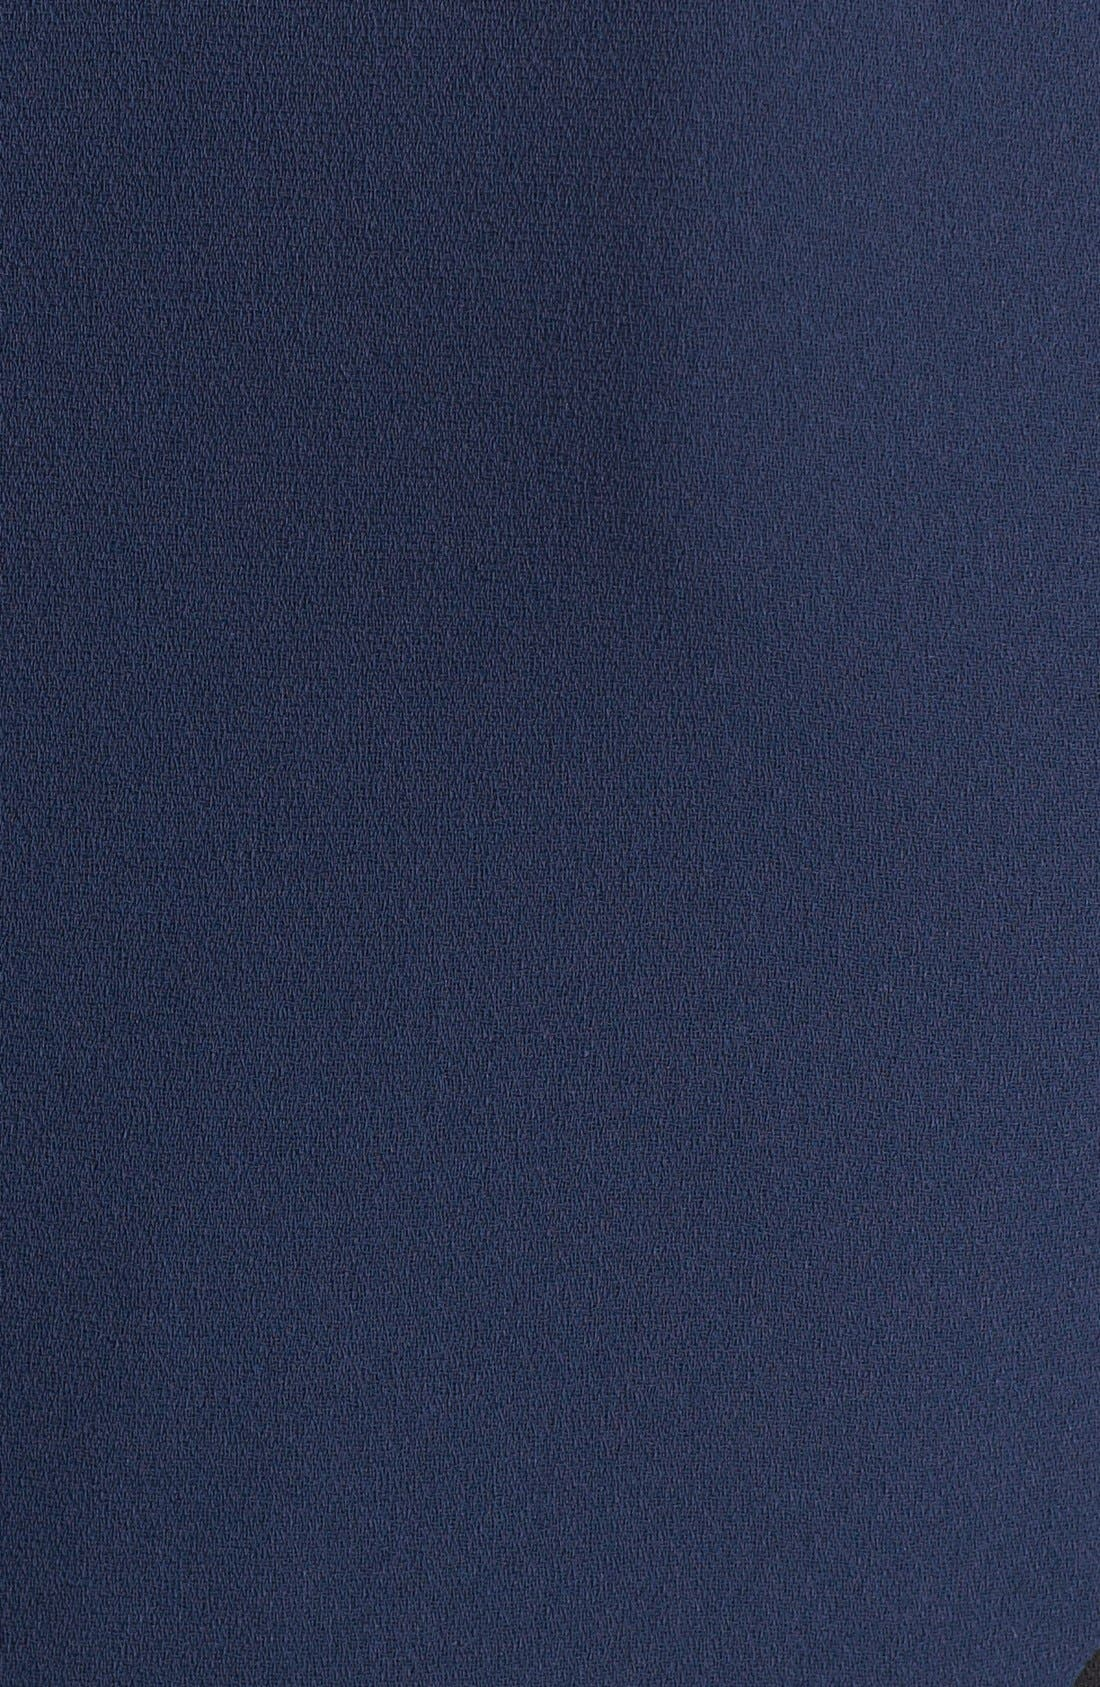 Alternate Image 3  - Rachel Roy Colorblock Crepe Sheath Dress